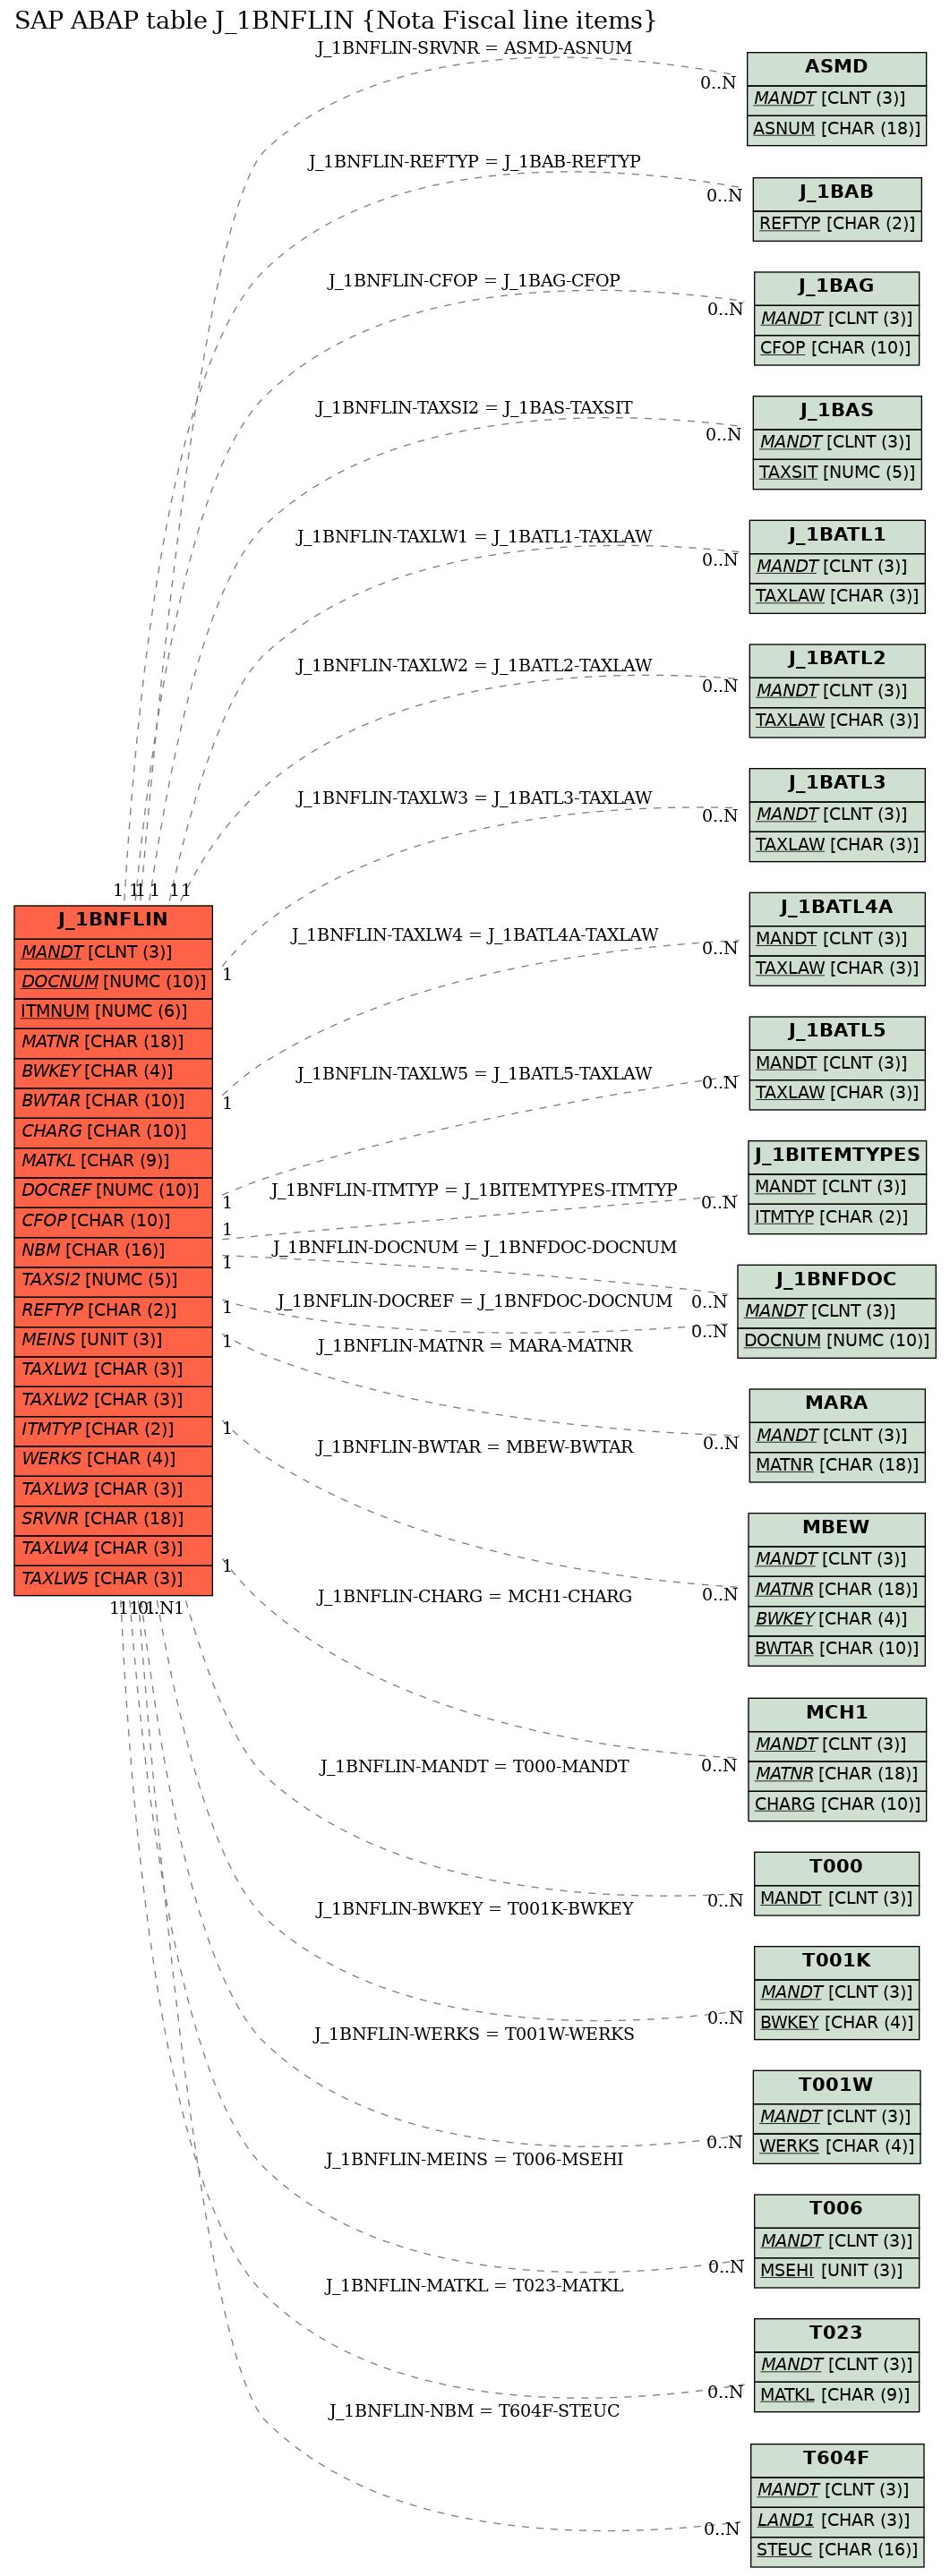 E-R Diagram for table J_1BNFLIN (Nota Fiscal line items)